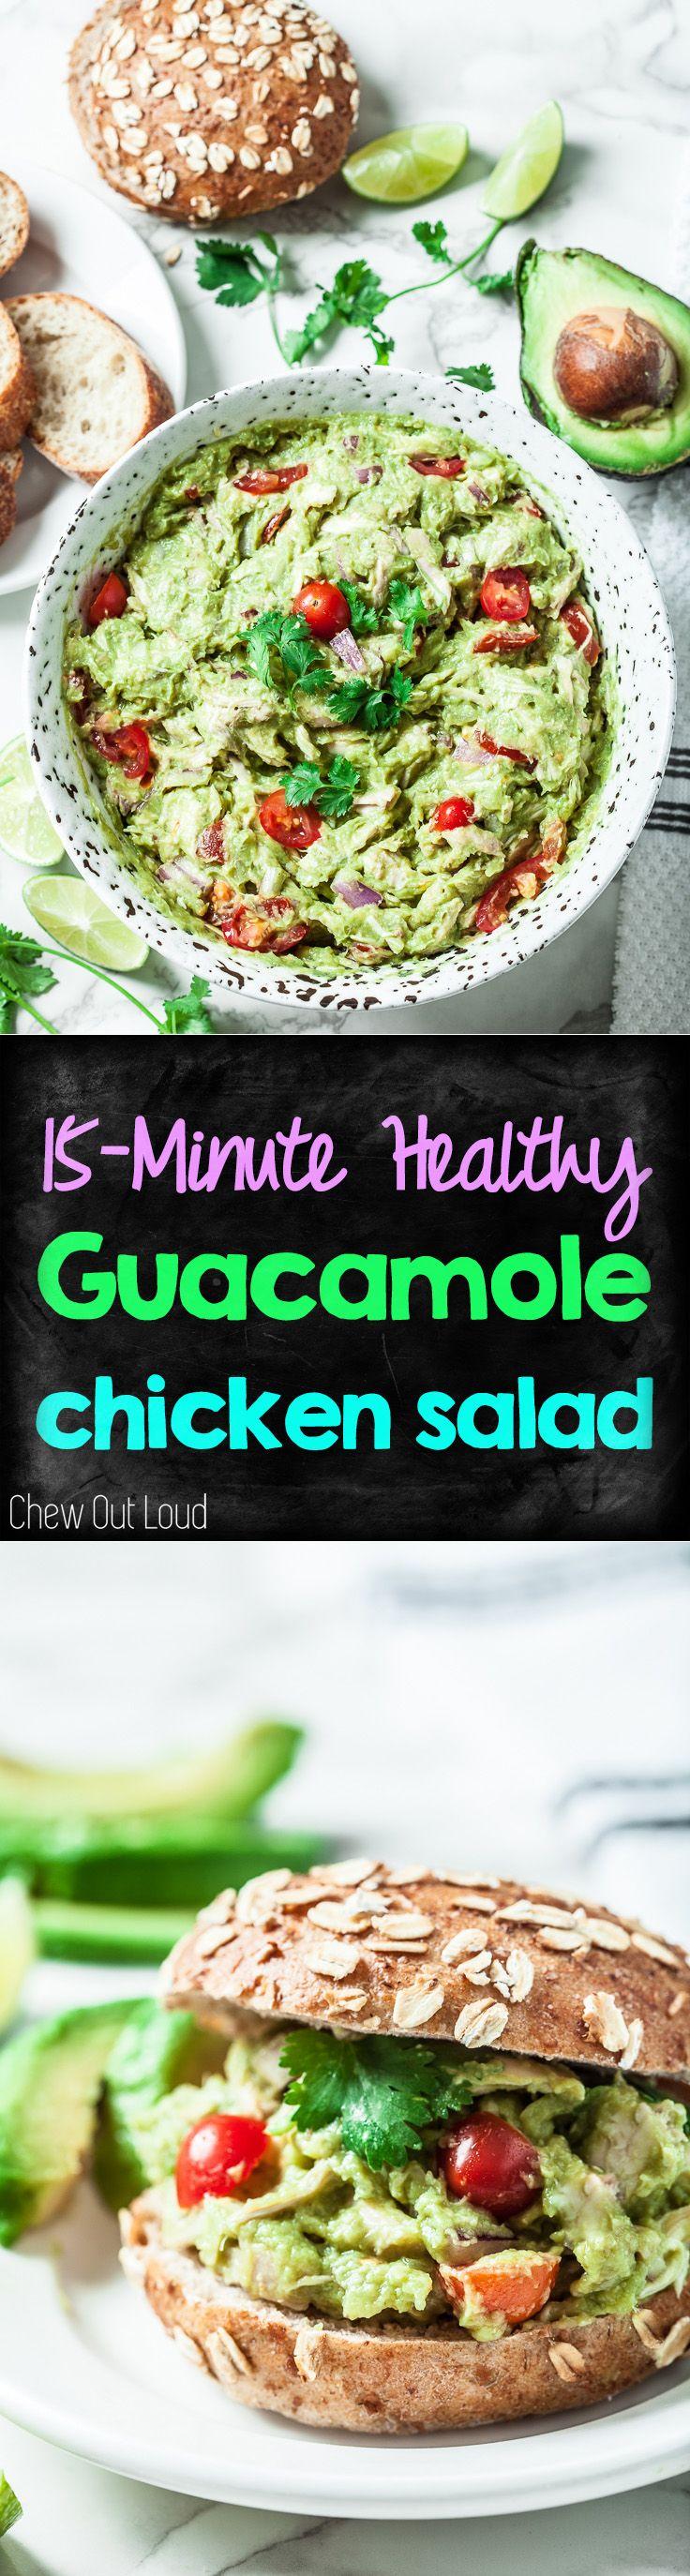 15-Minute Healthy Guacamole Chicken Salad. Great in sandwiches, pita pockets, baguette slices, or scoop chips! #guacamole #avocado #chicken #salad www.chewoutloud.com